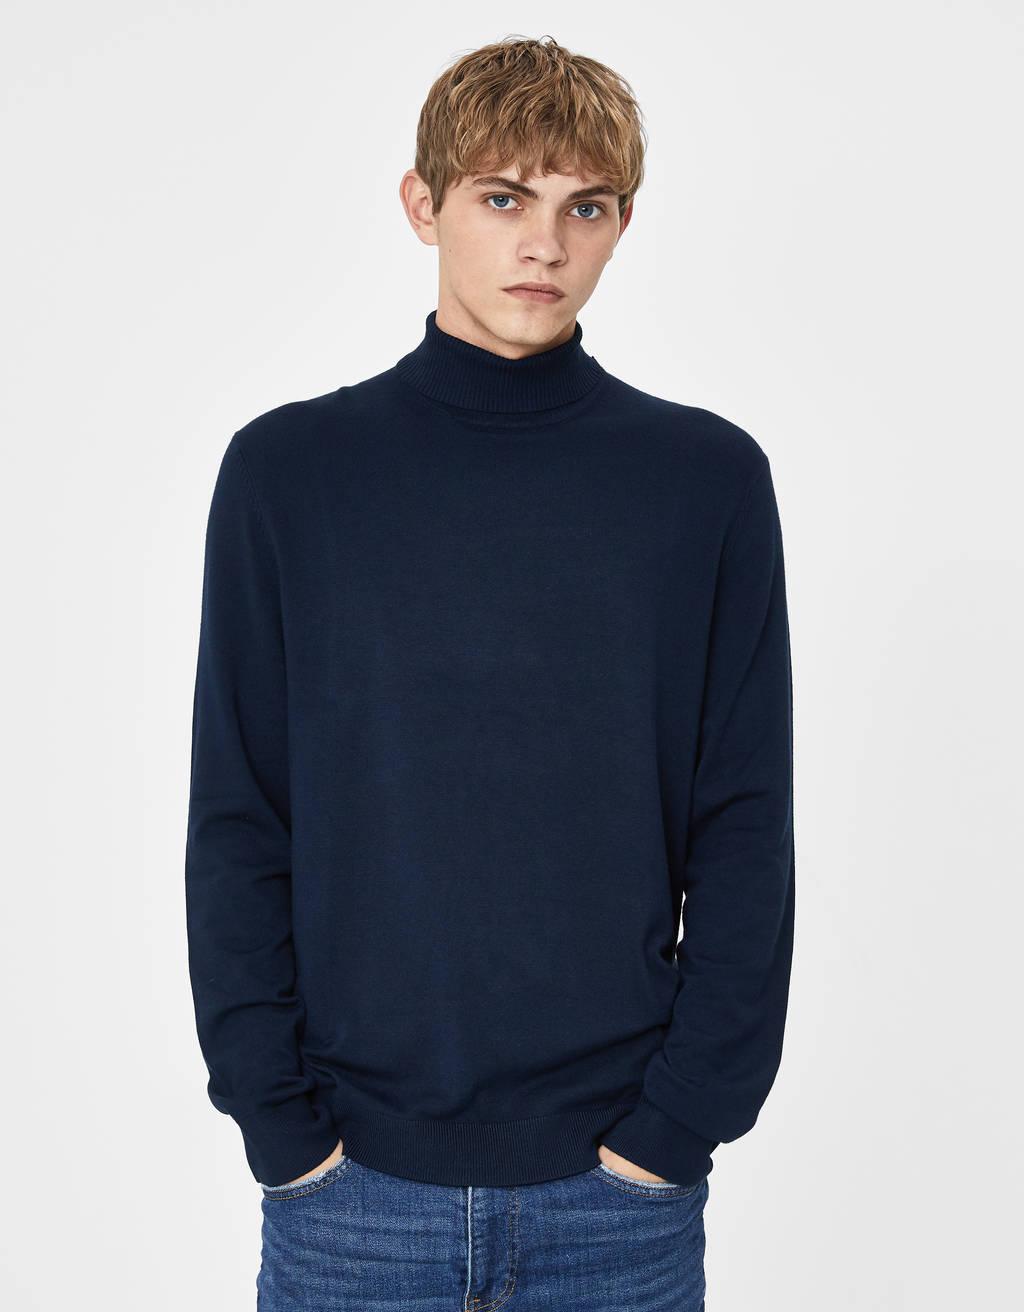 Sweater de gola alta